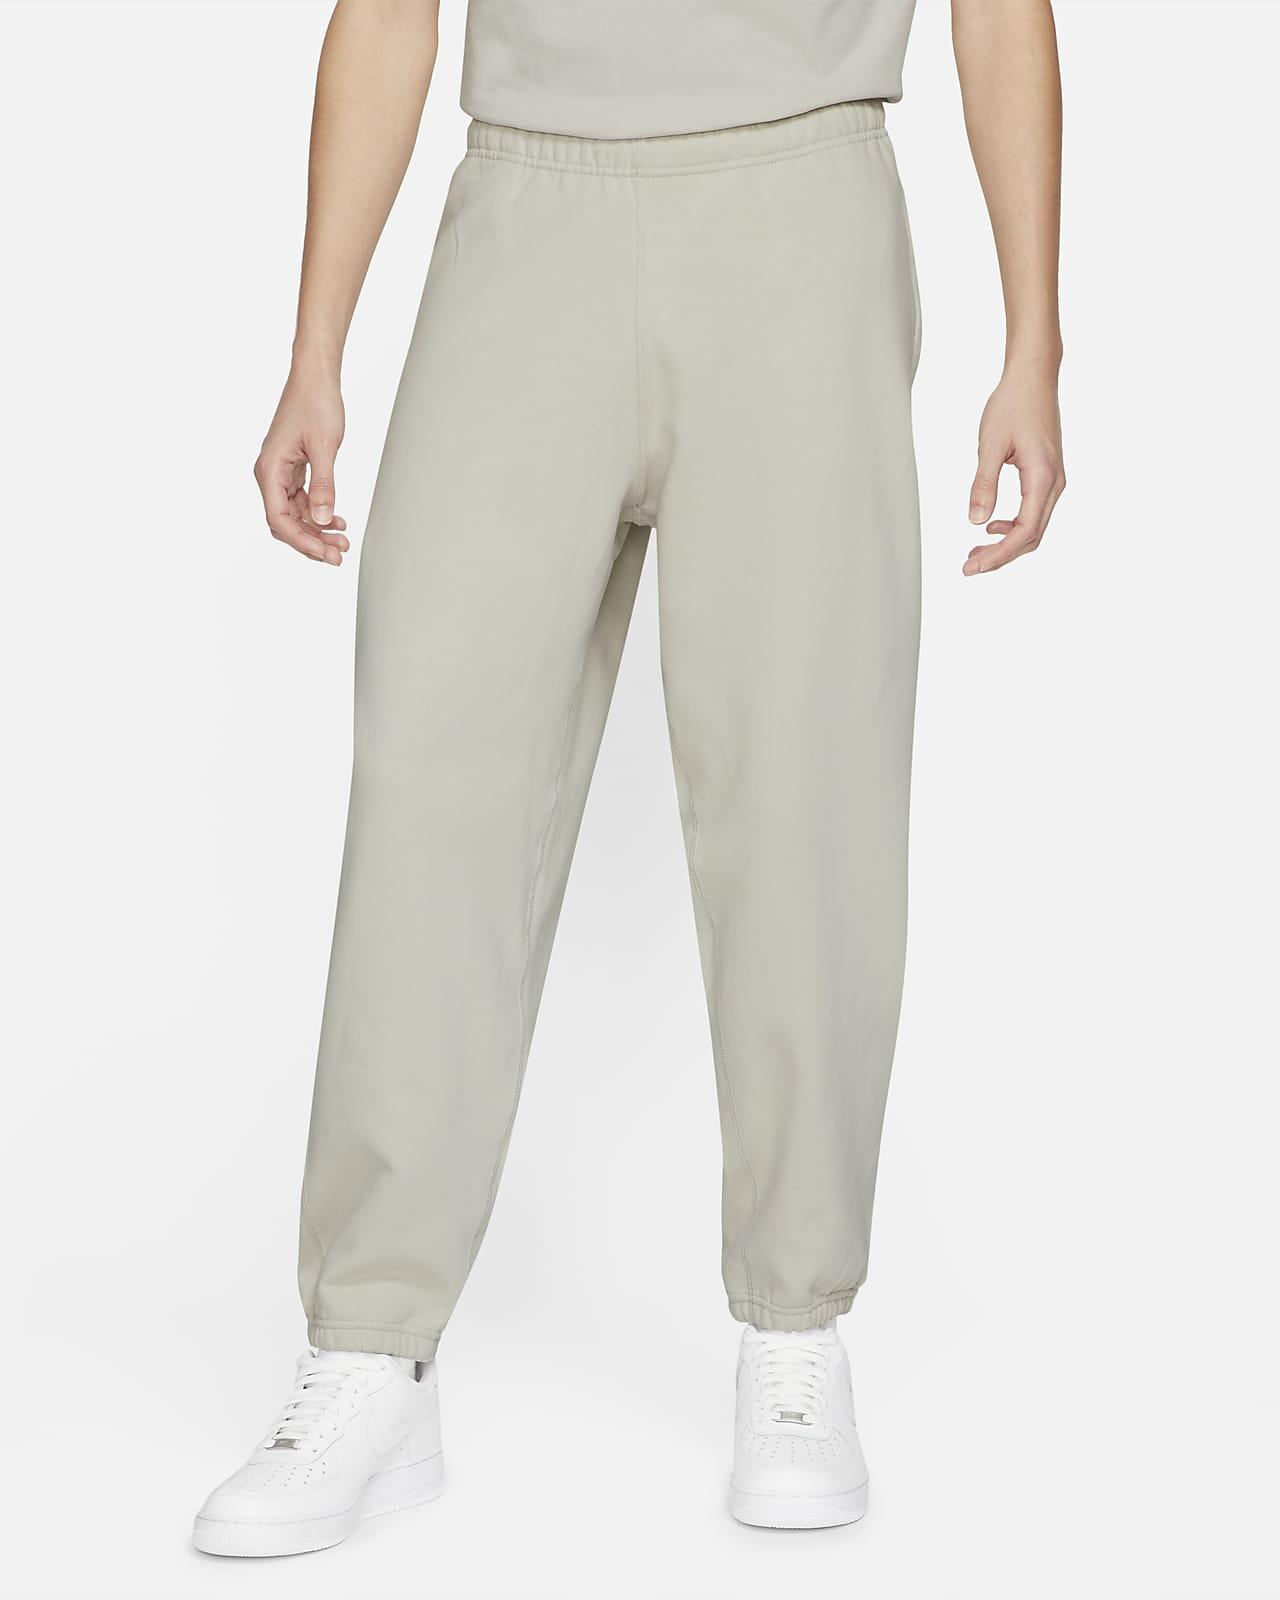 Pantaloni in fleece NikeLab